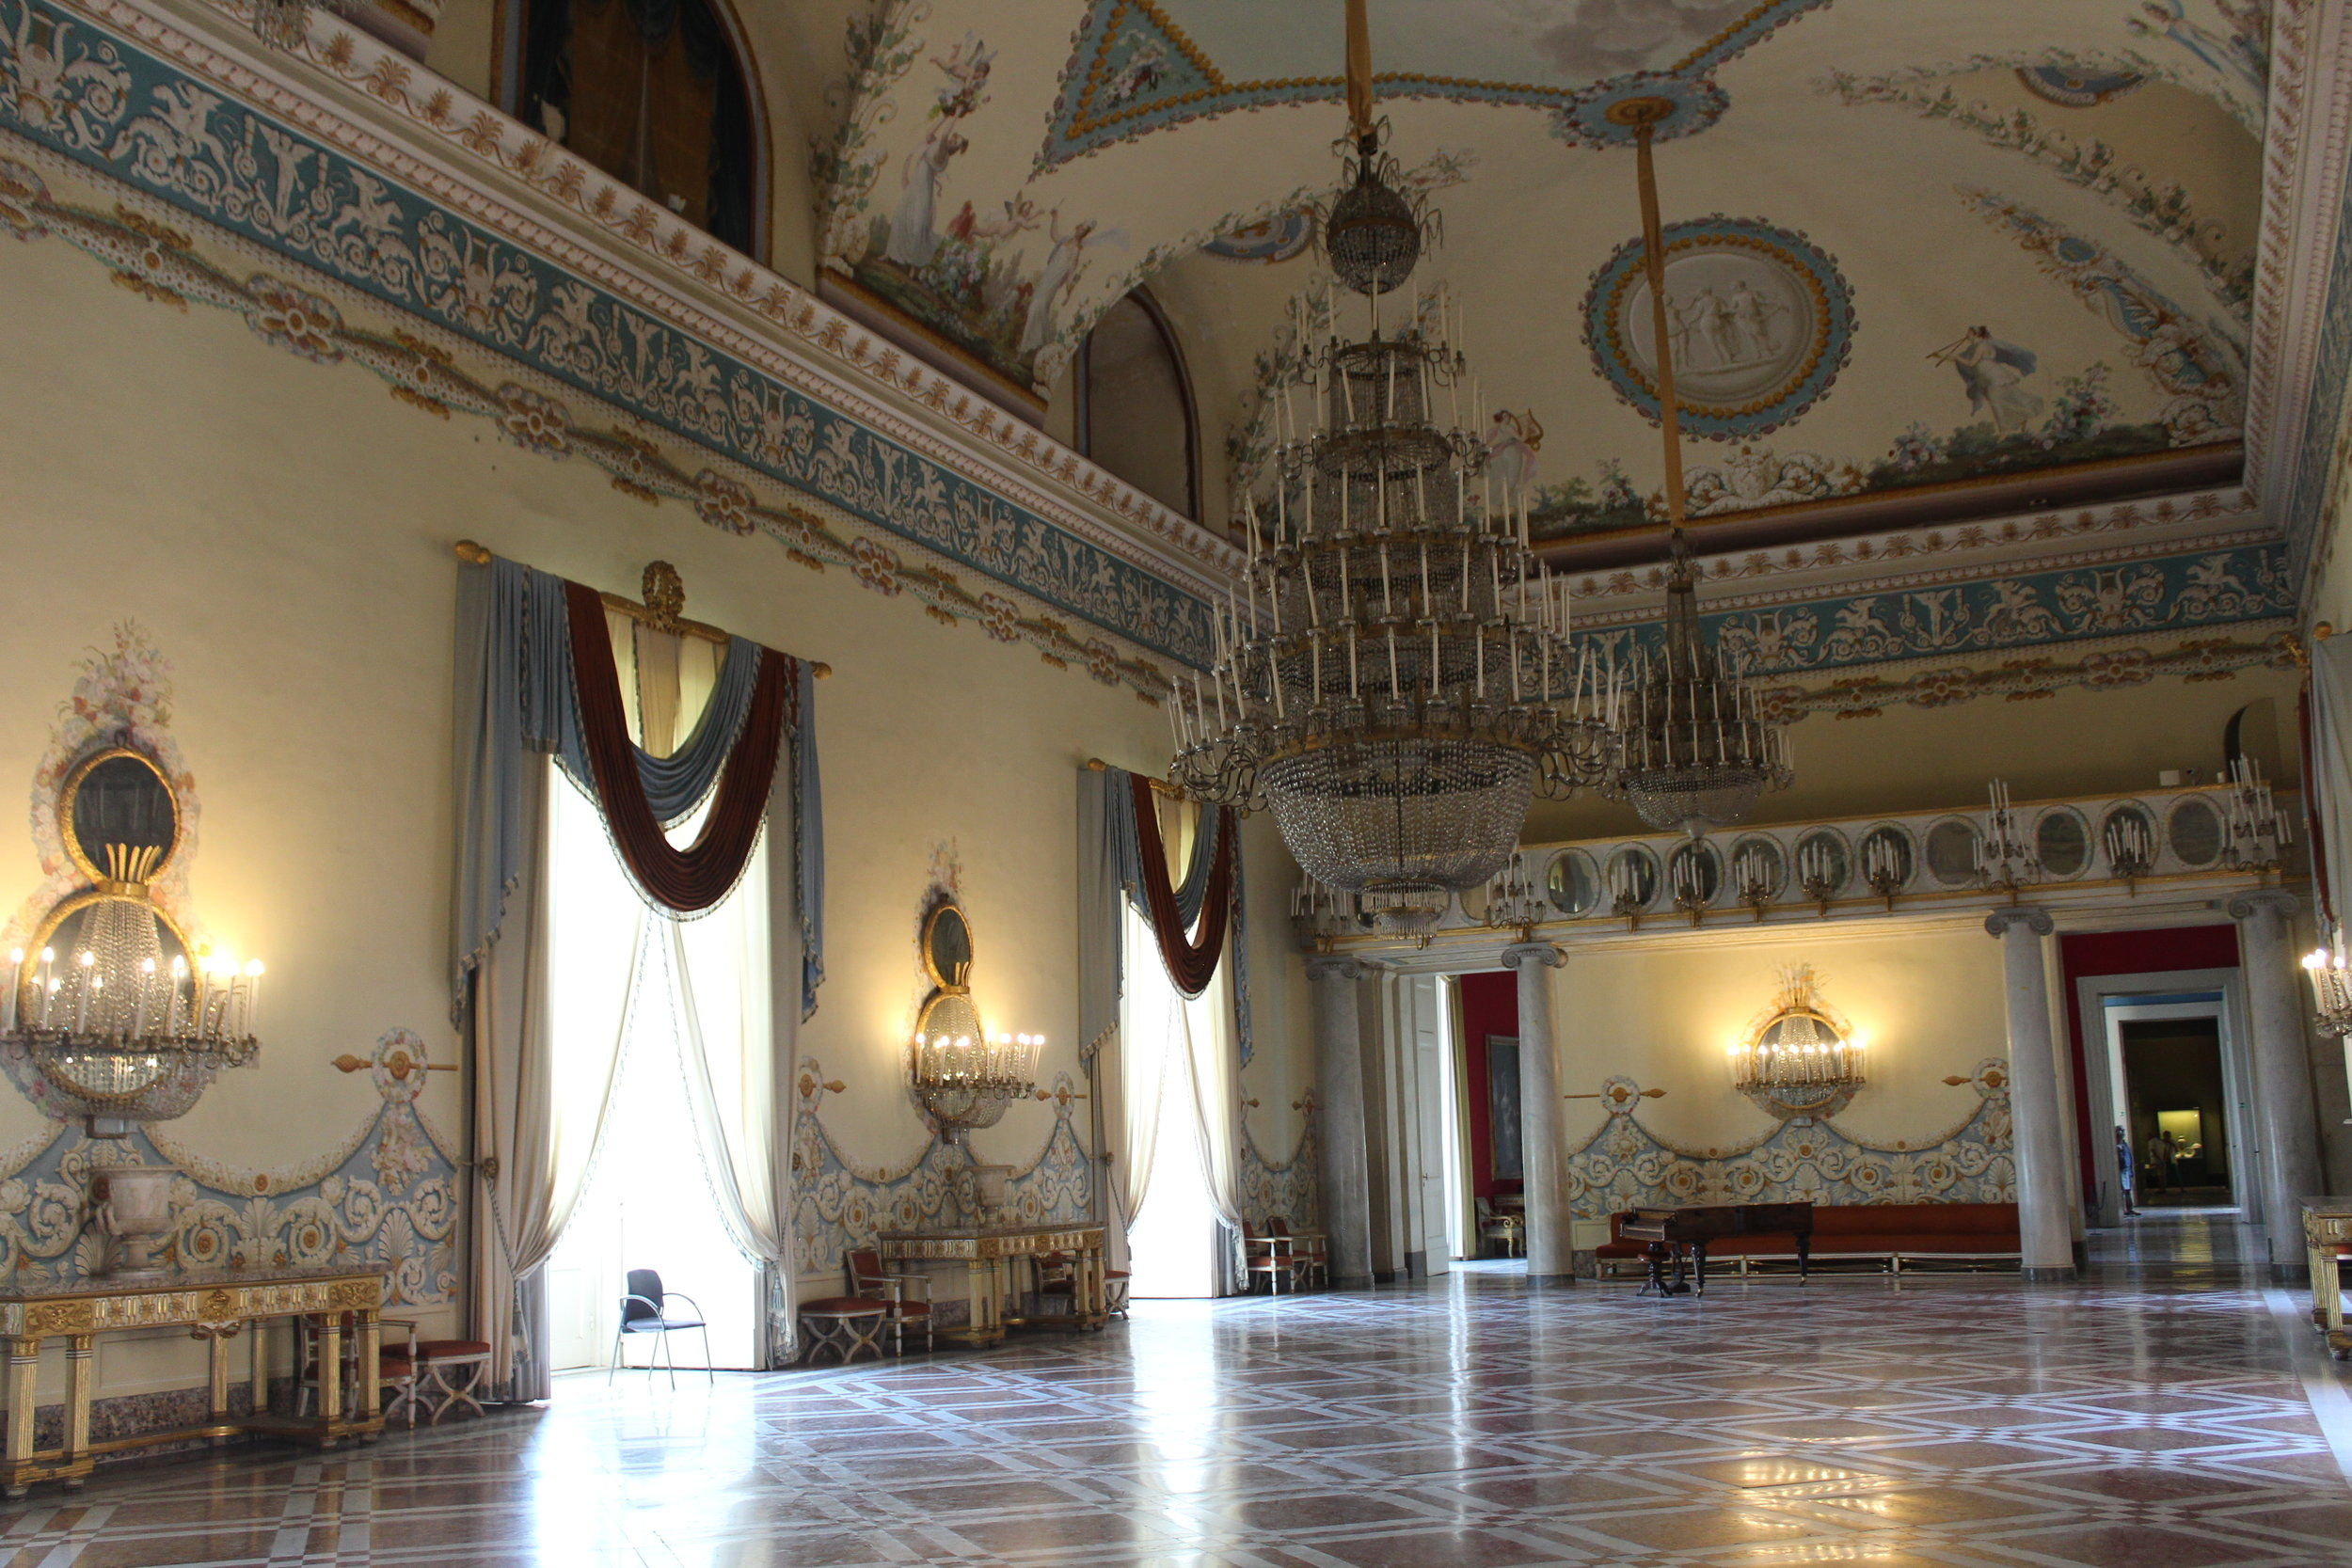 Bourbon salon rooms inside Museo di Capodimonte feel like a trip to Versailles